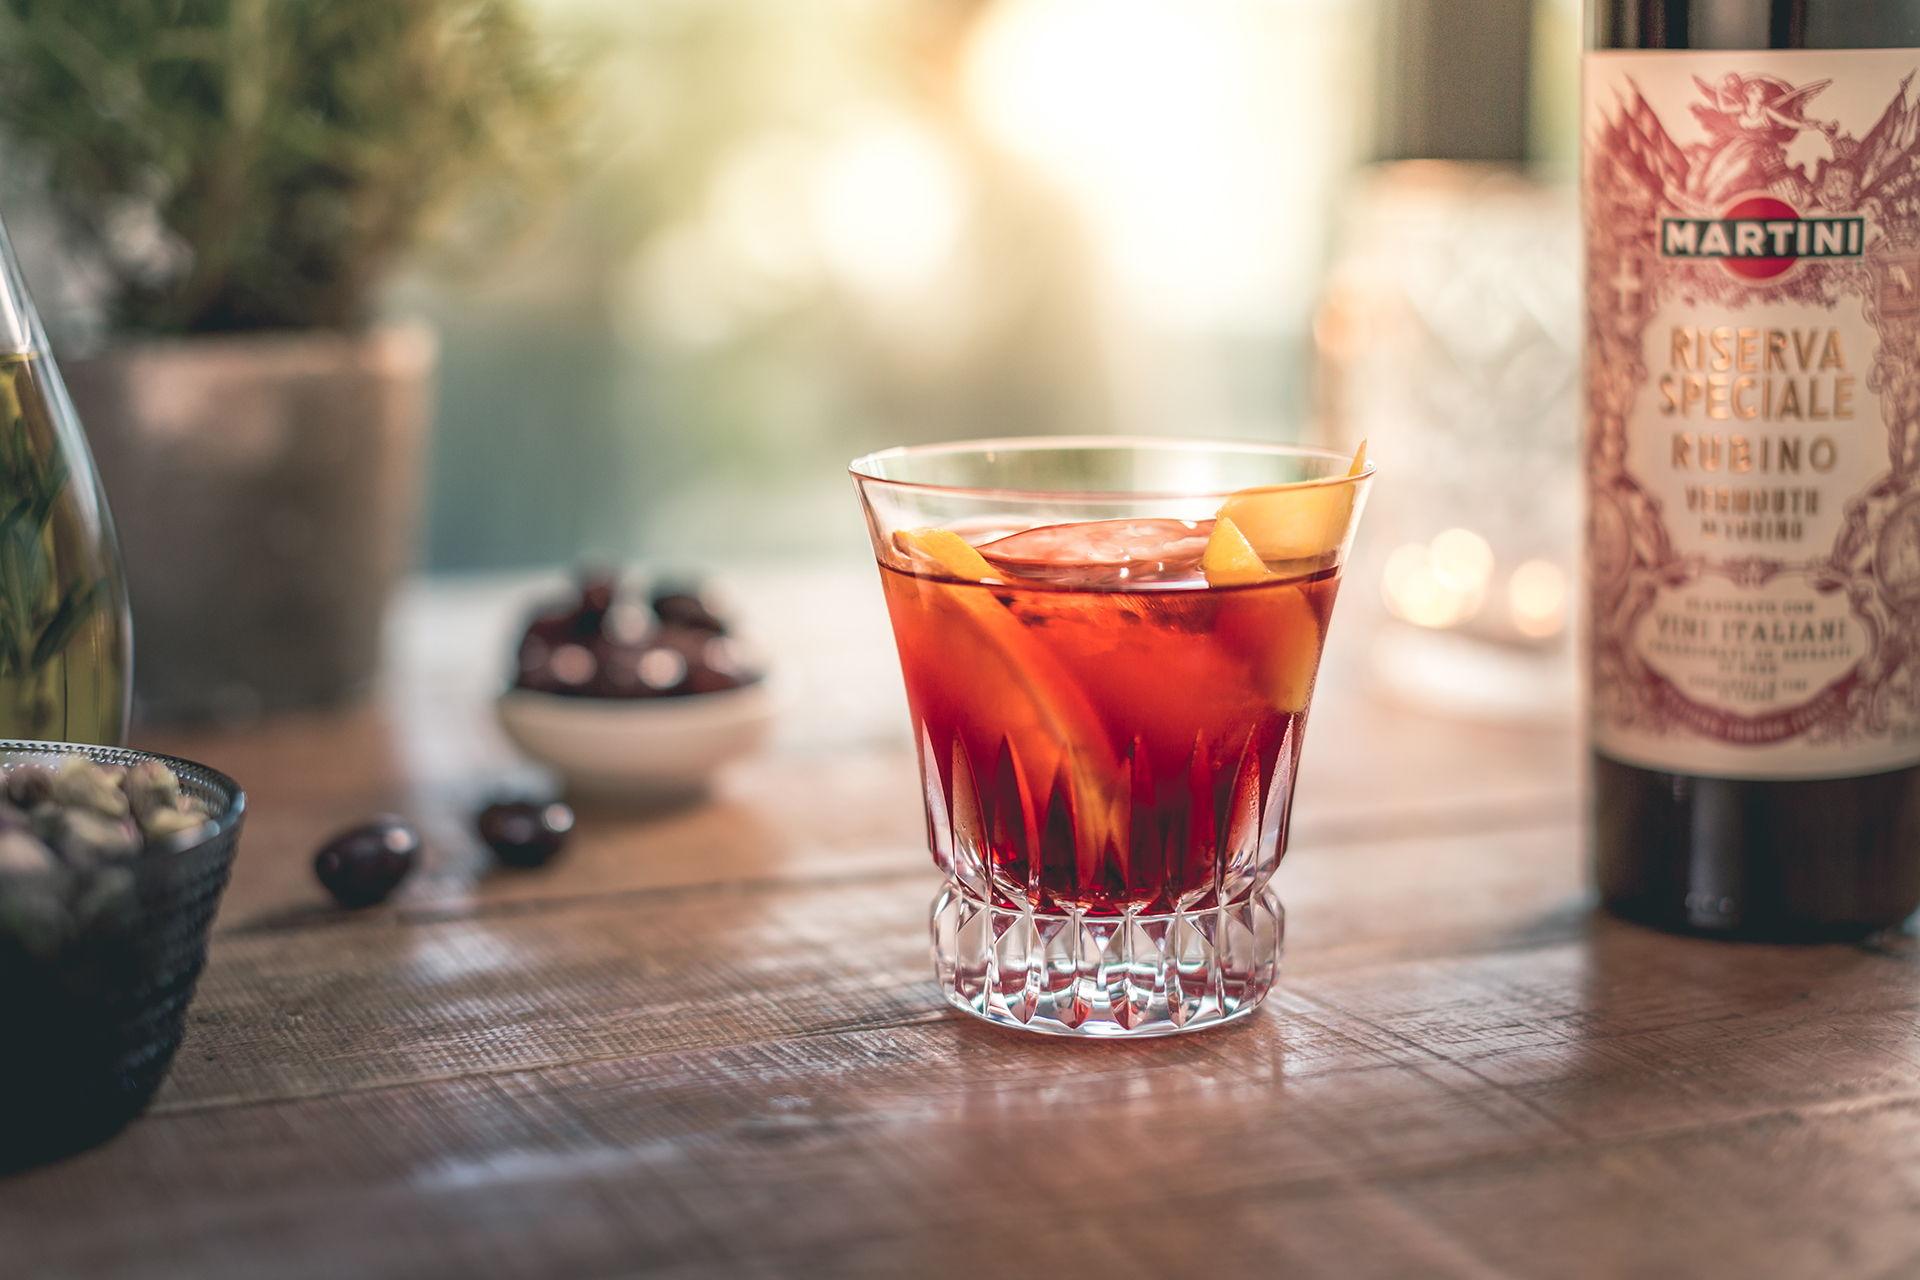 Martini-Rubino-Negroni-After